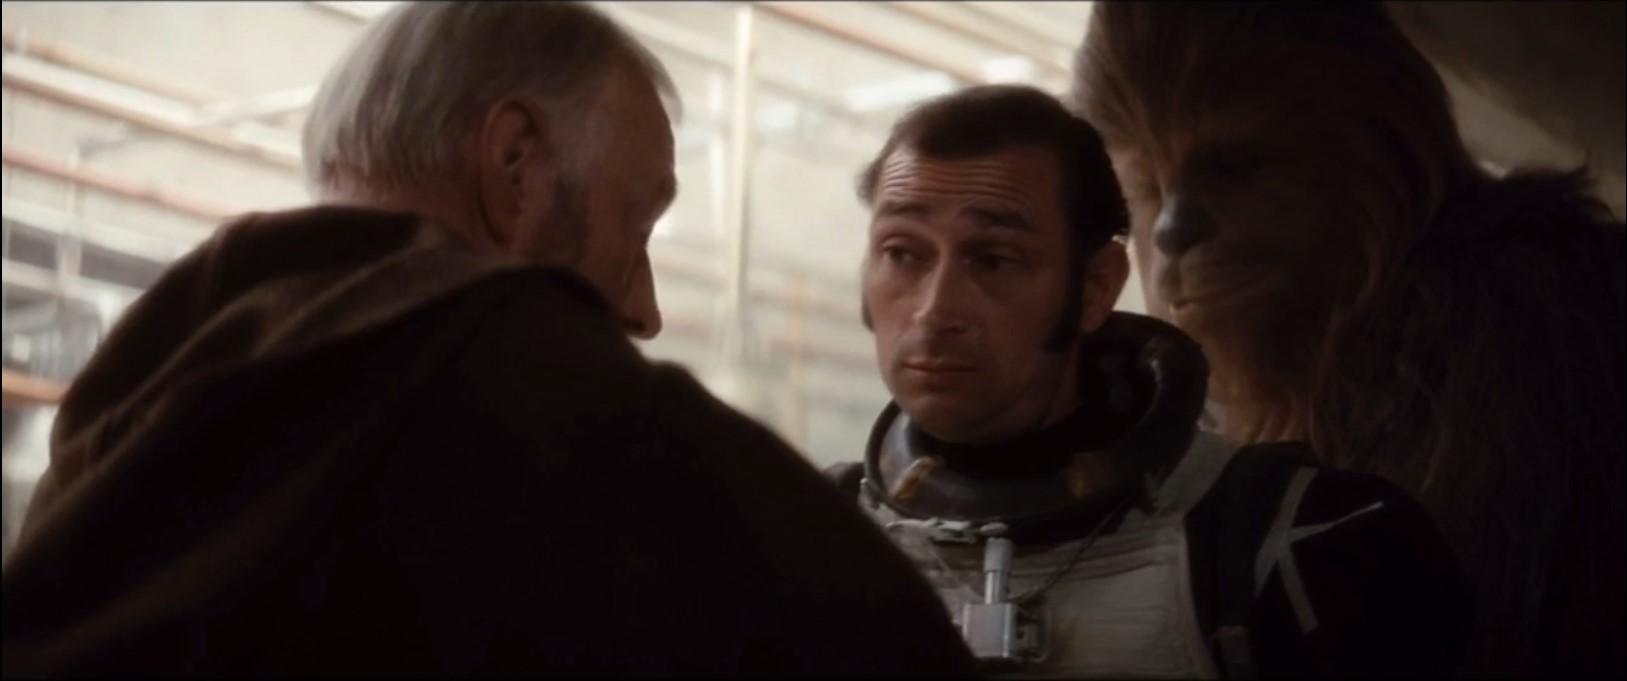 Basil Tomlin as Bo Shek in Star Wars A New Hope. Bossk suit prop